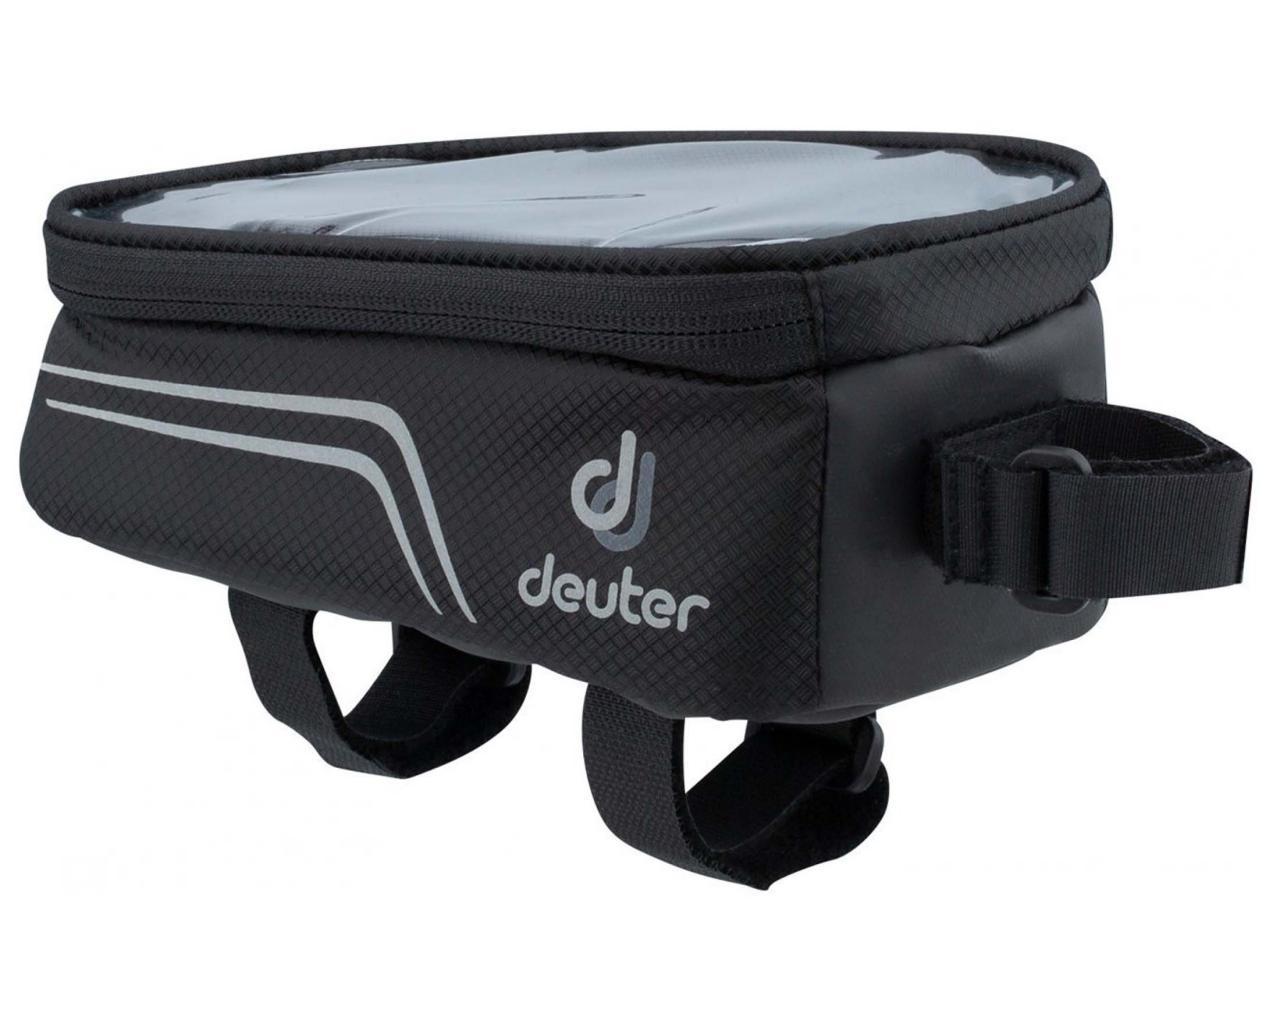 Велосумки Велосумка Deuter Energy Bag II (2020) Energy-Bag-II_black_1_65295_2200x1760_1280x1280.jpg